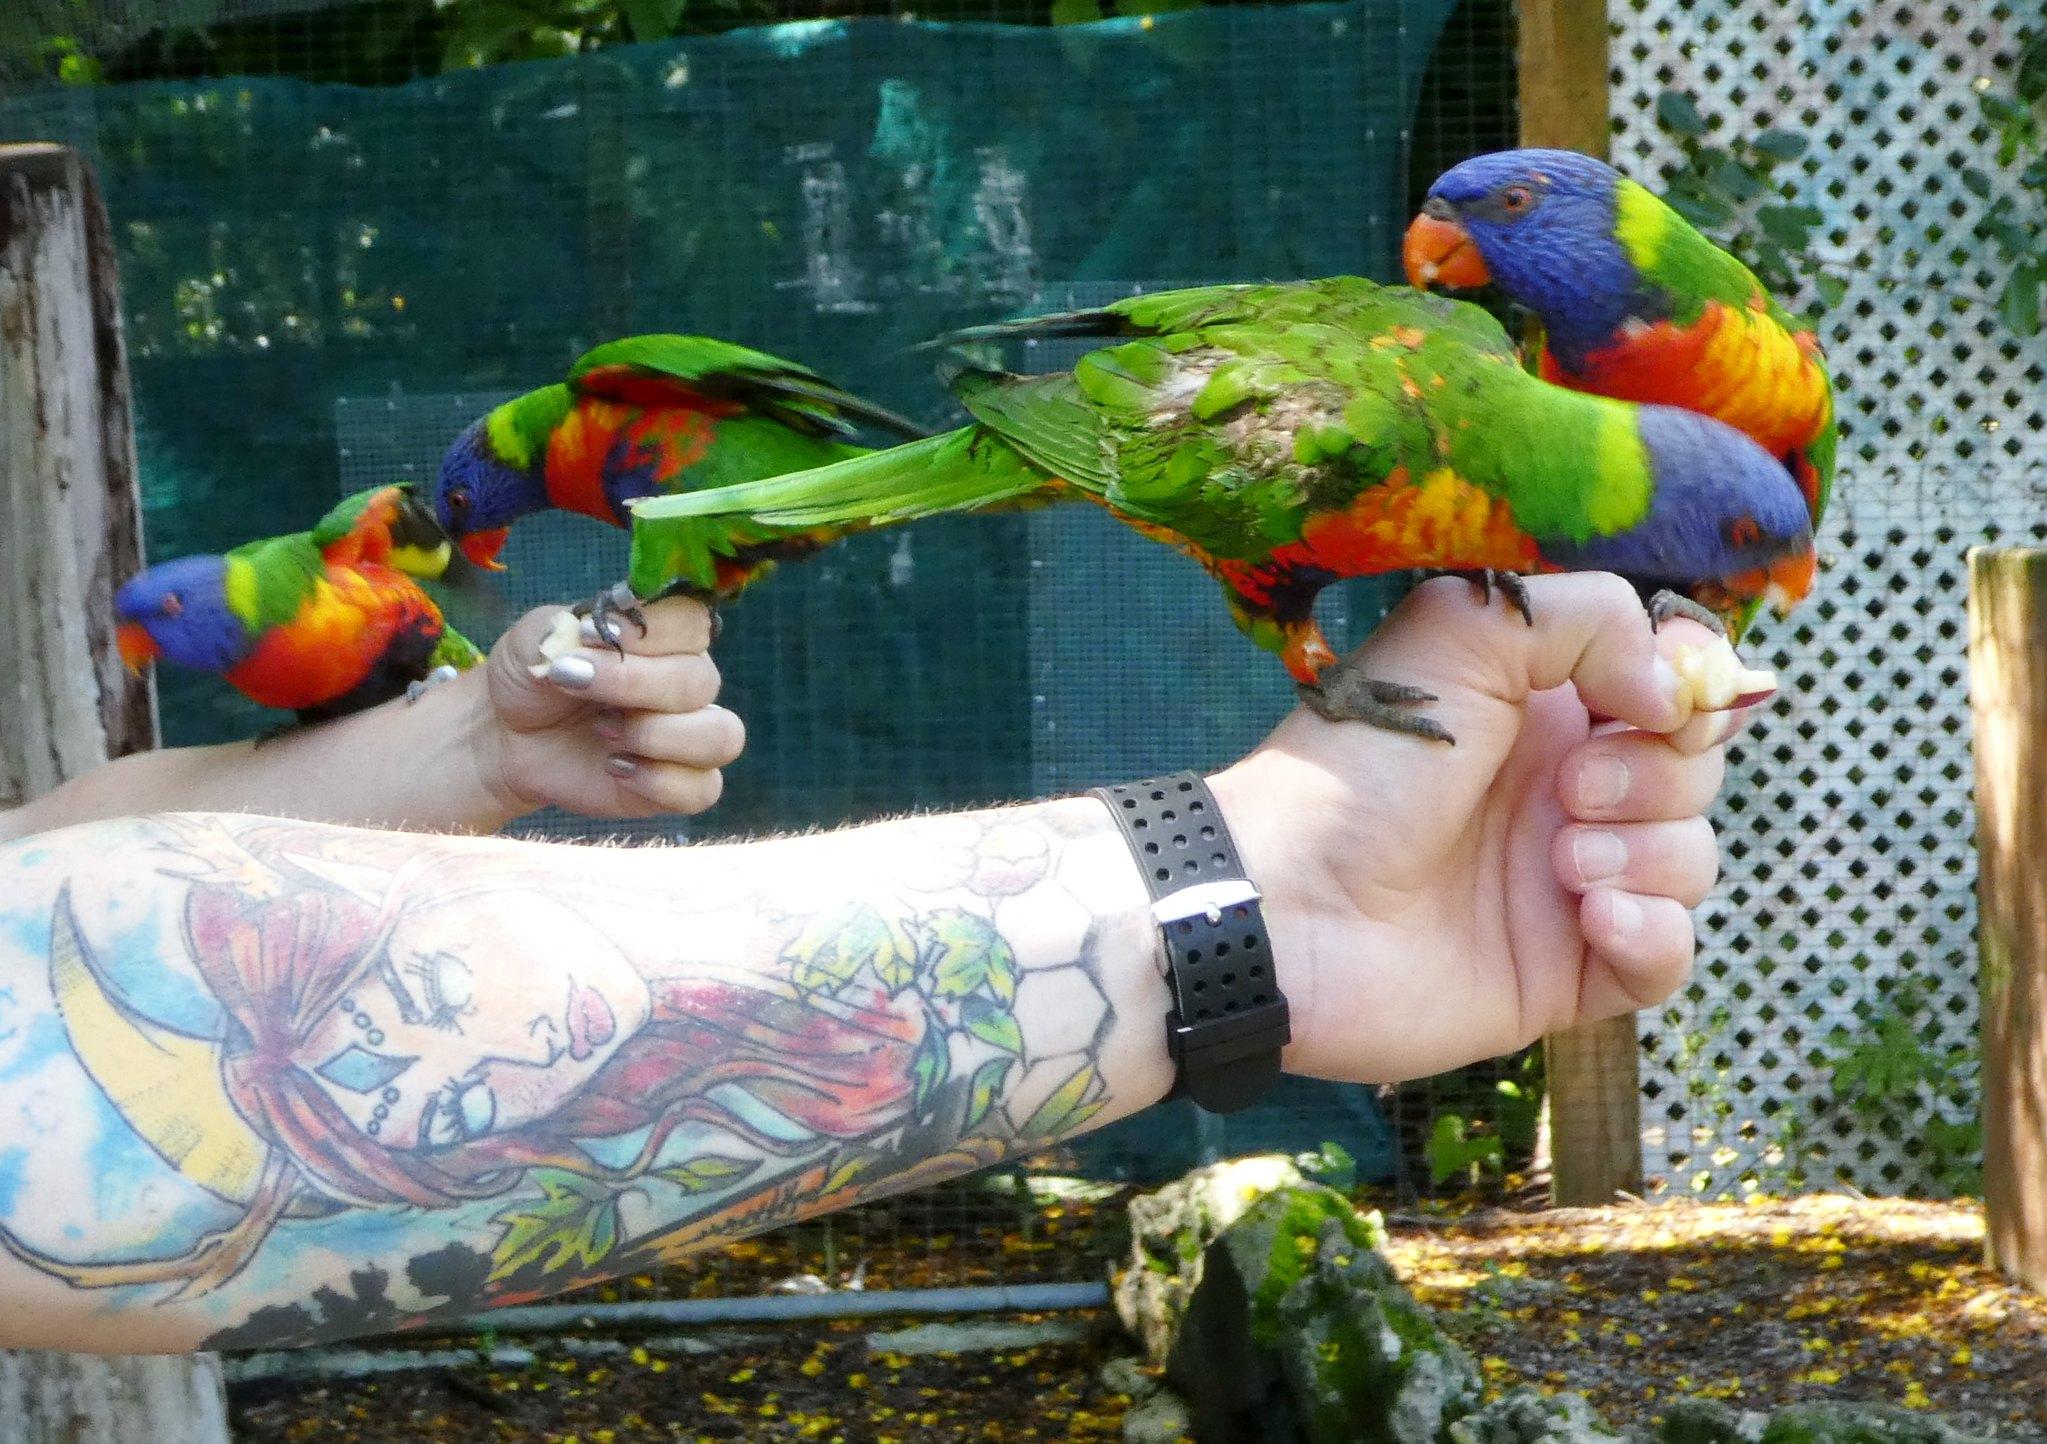 Ardastra Gardens & Zoo